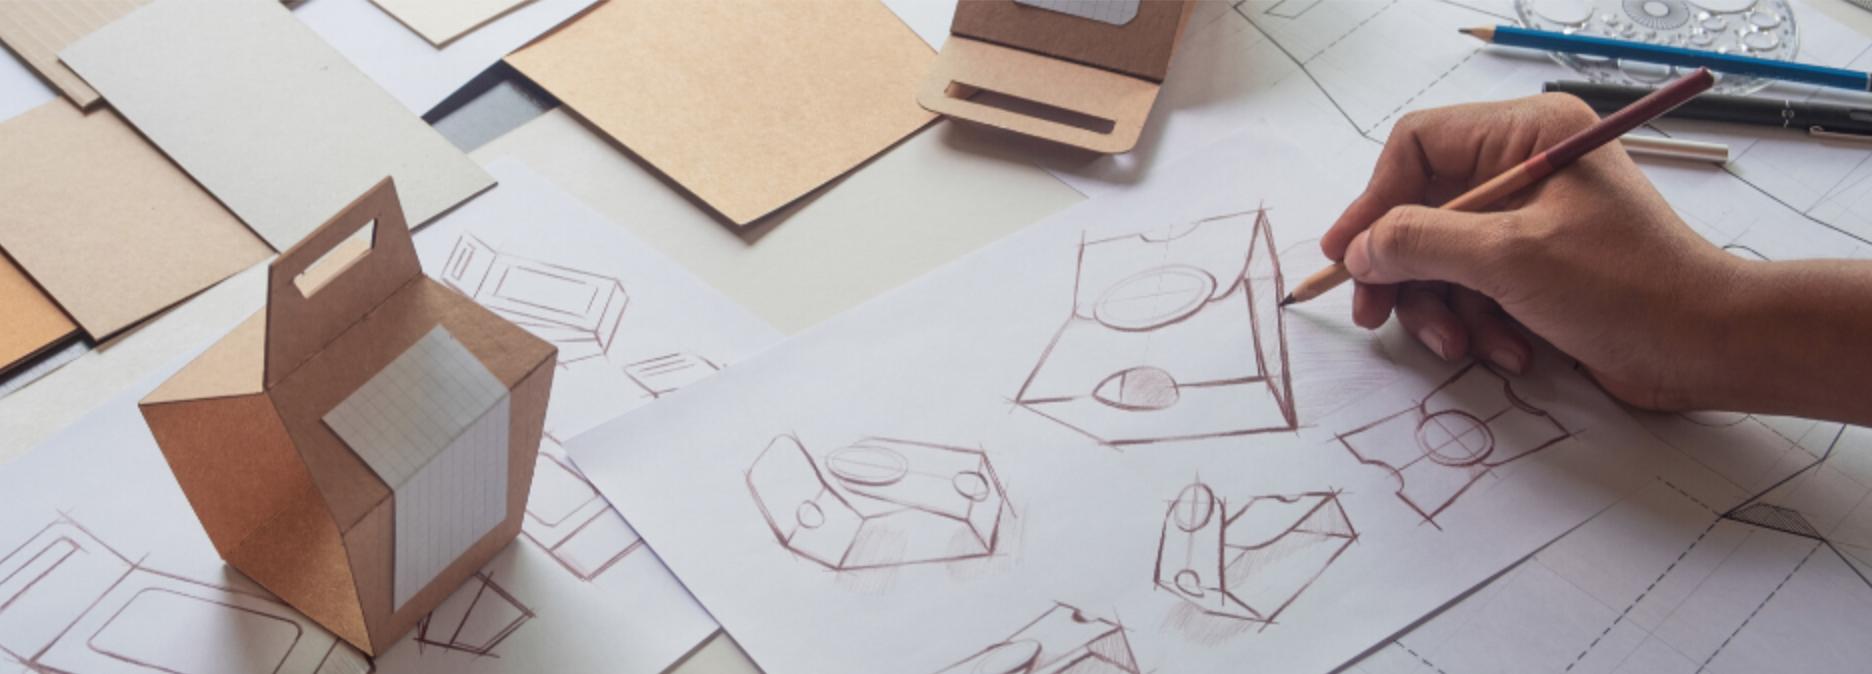 diseño de packaging en cartón